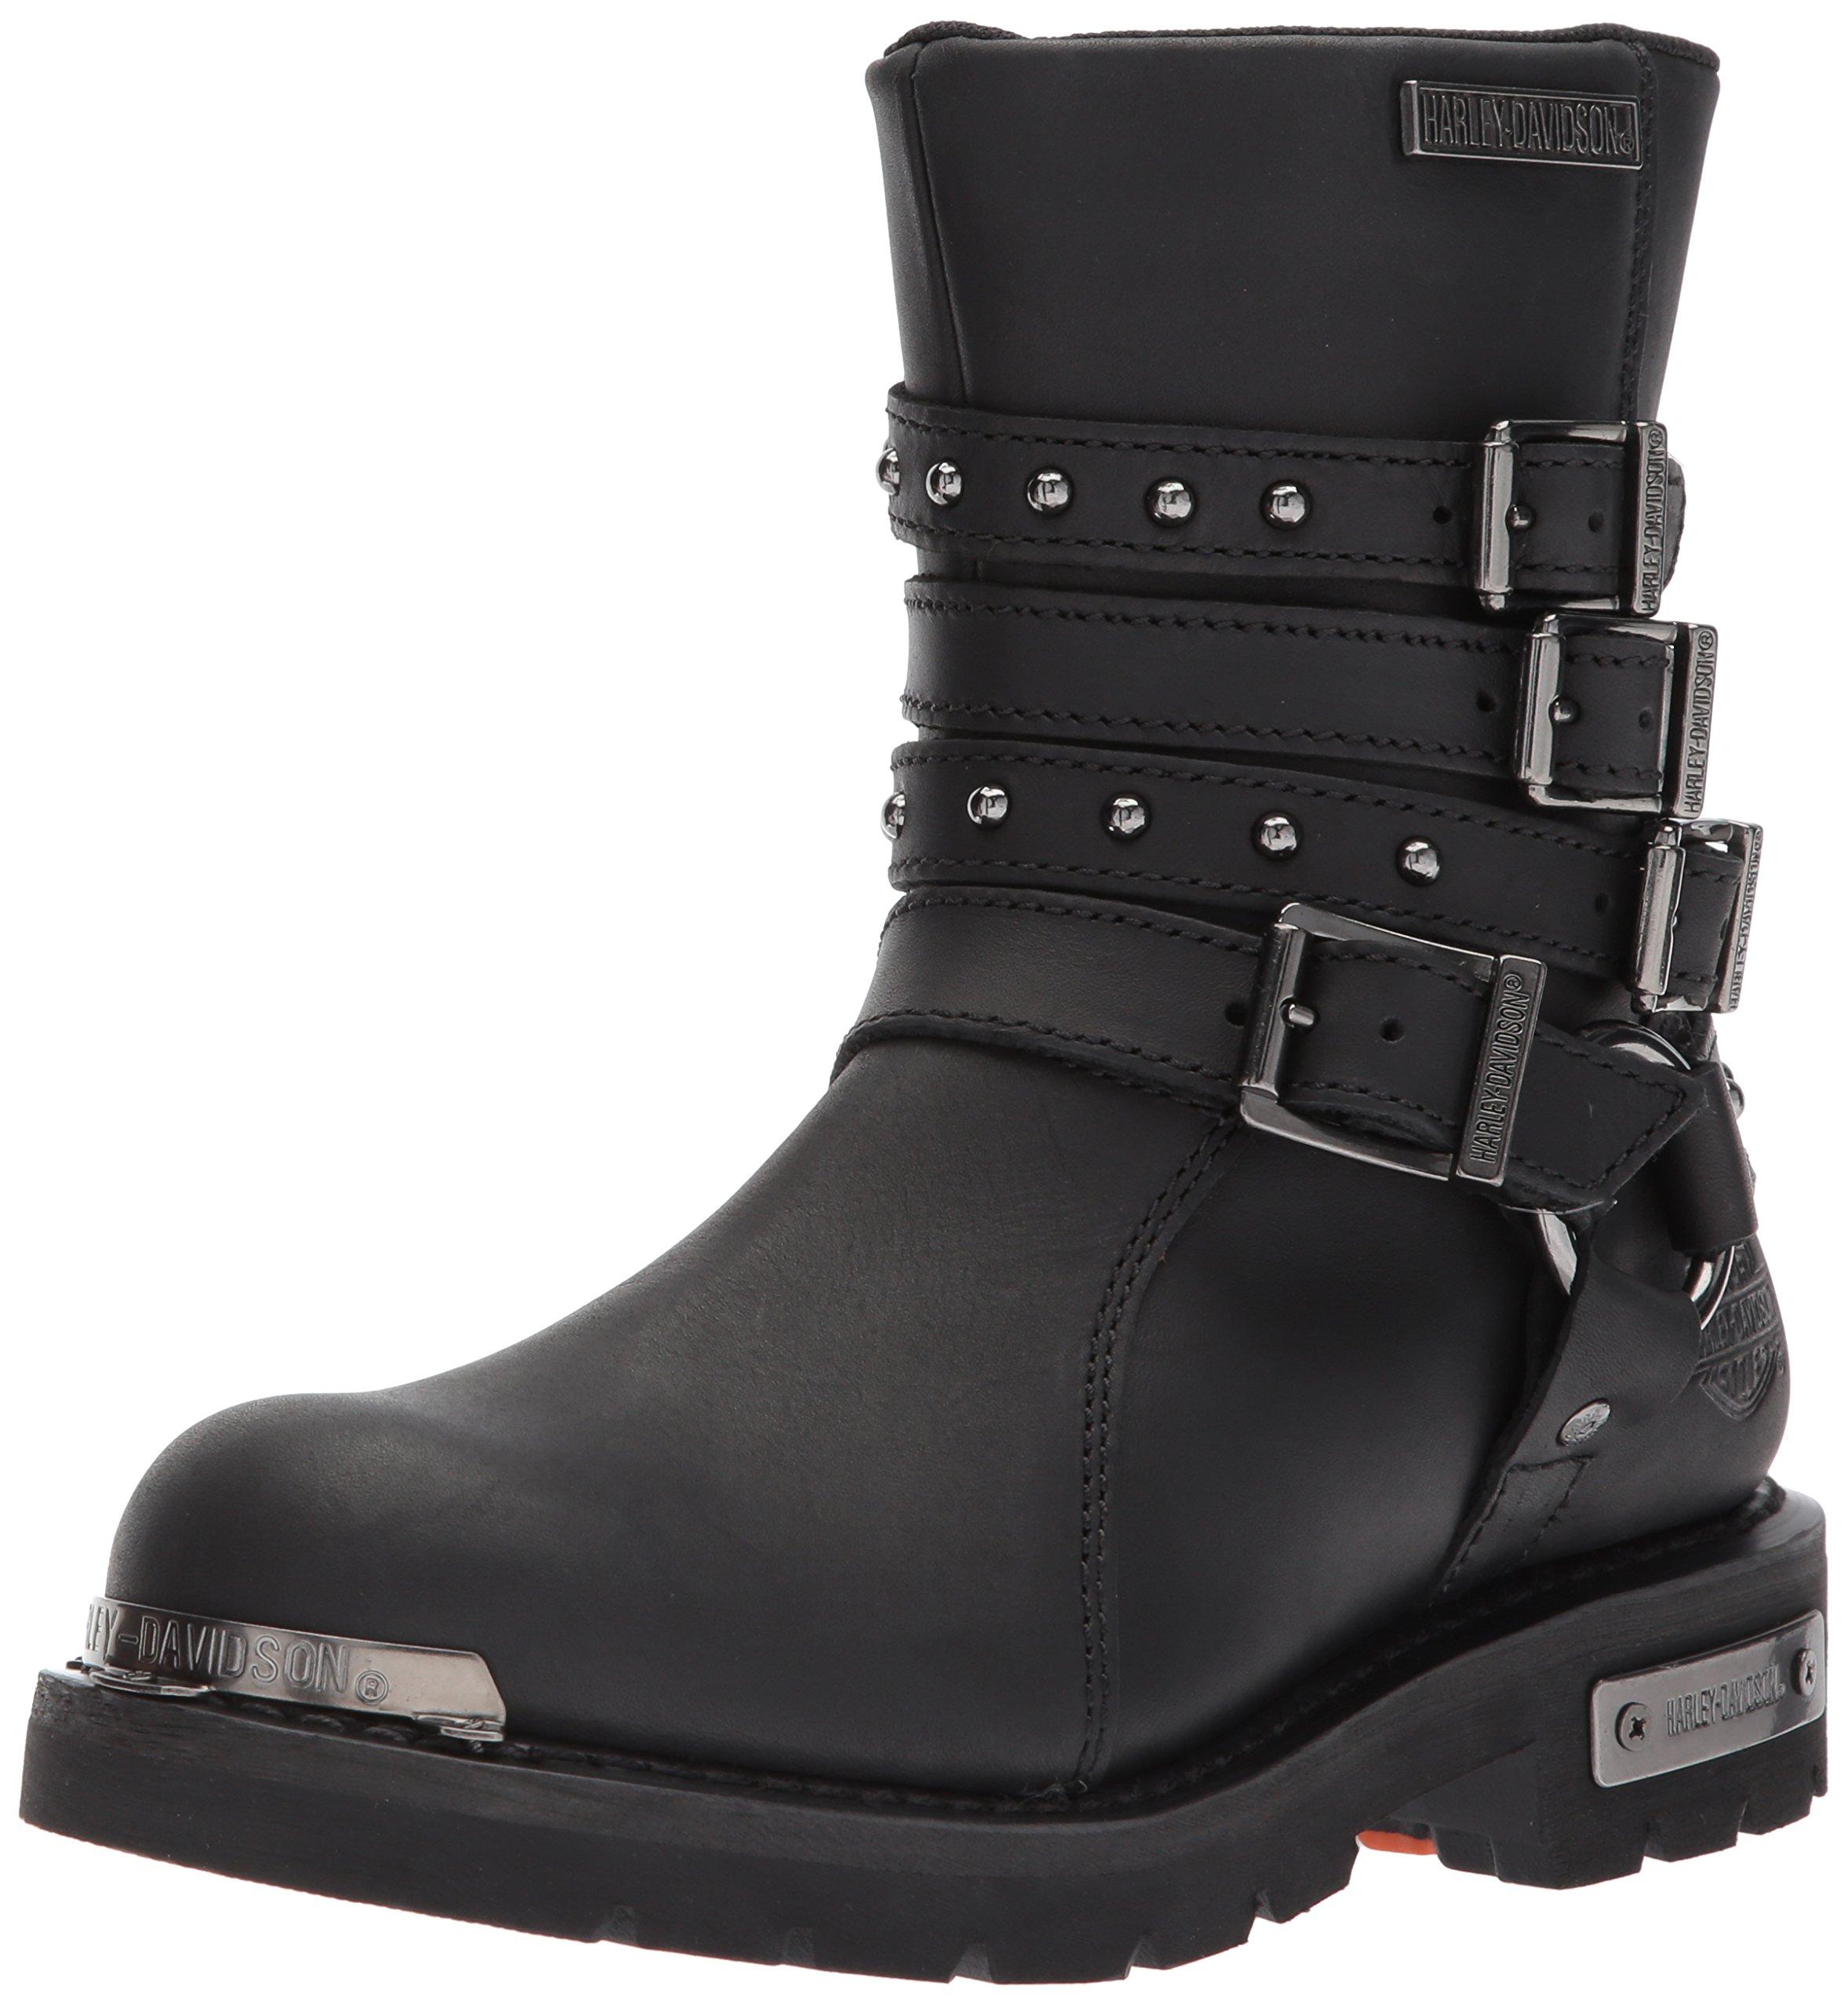 Harley-Davidson Women's Eddington Work Boot, Black, 9 M US